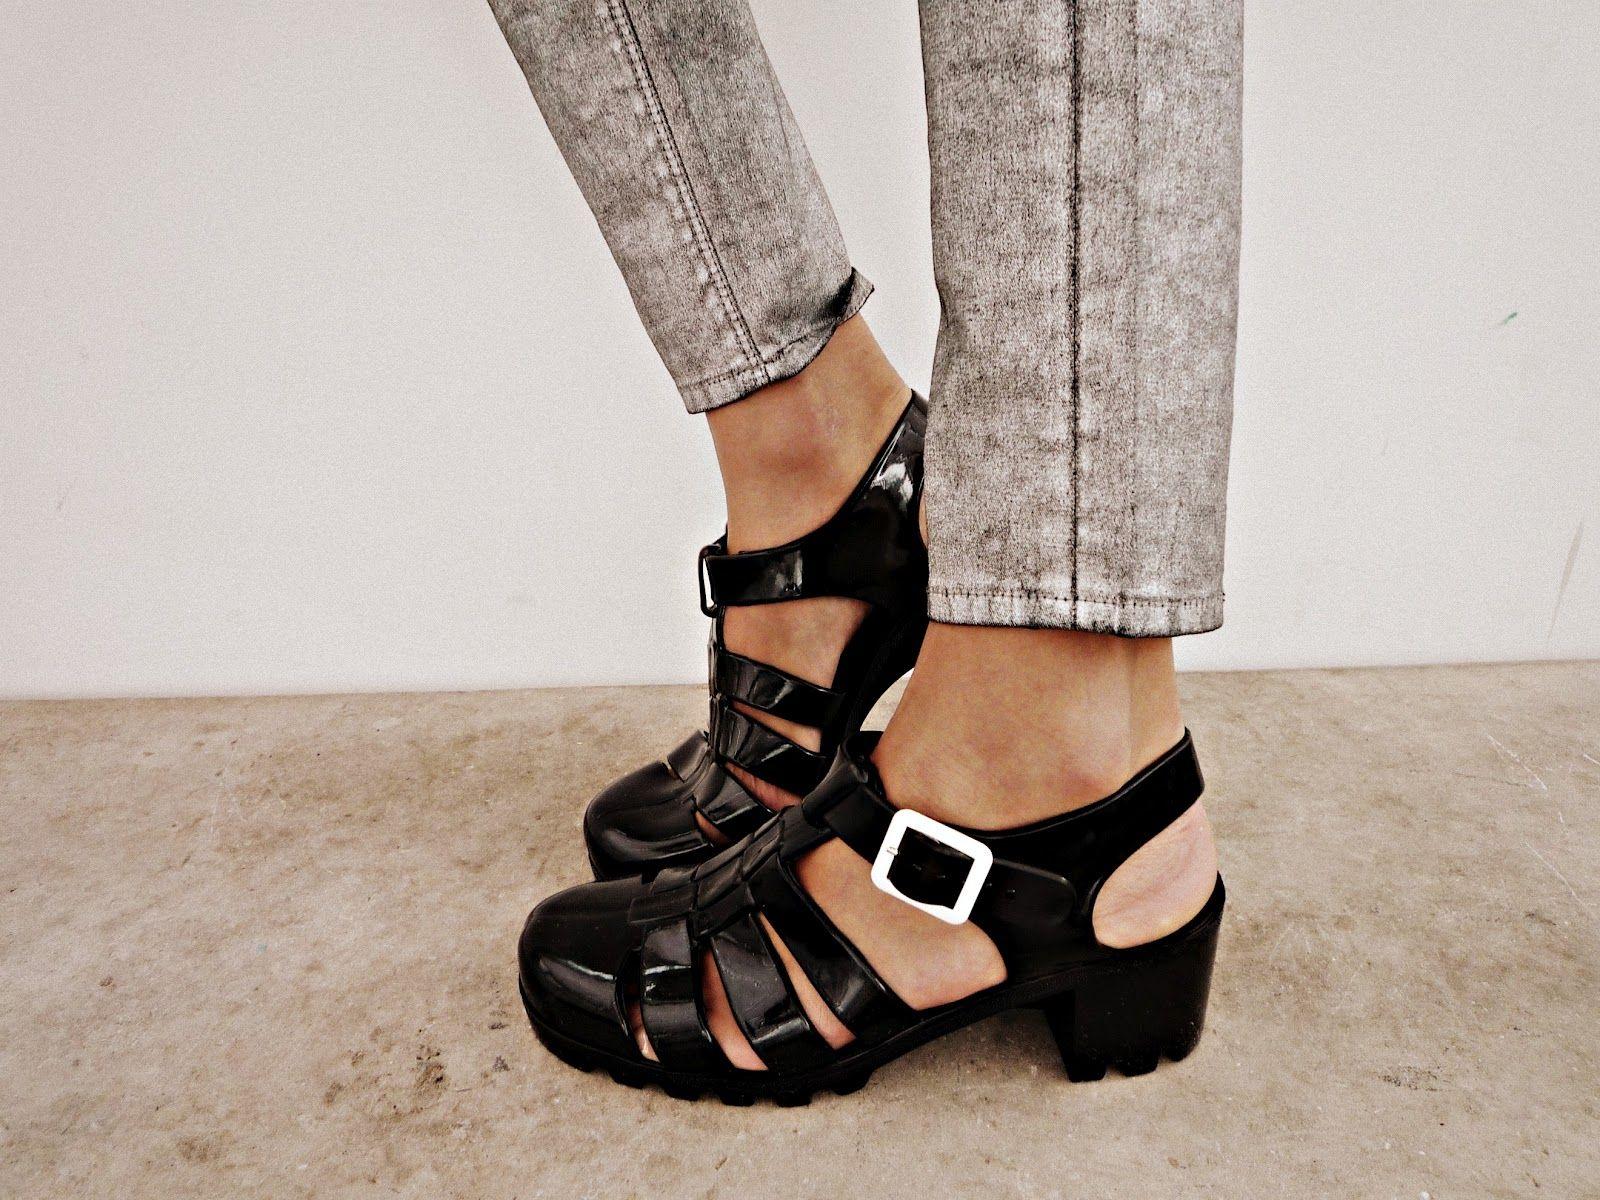 Black jelly sandals american apparel - Juju Footwear Tinkerbelle Mini Wedge Heeled Jelly Sandal Jelly Jelly Sandals And Footwear